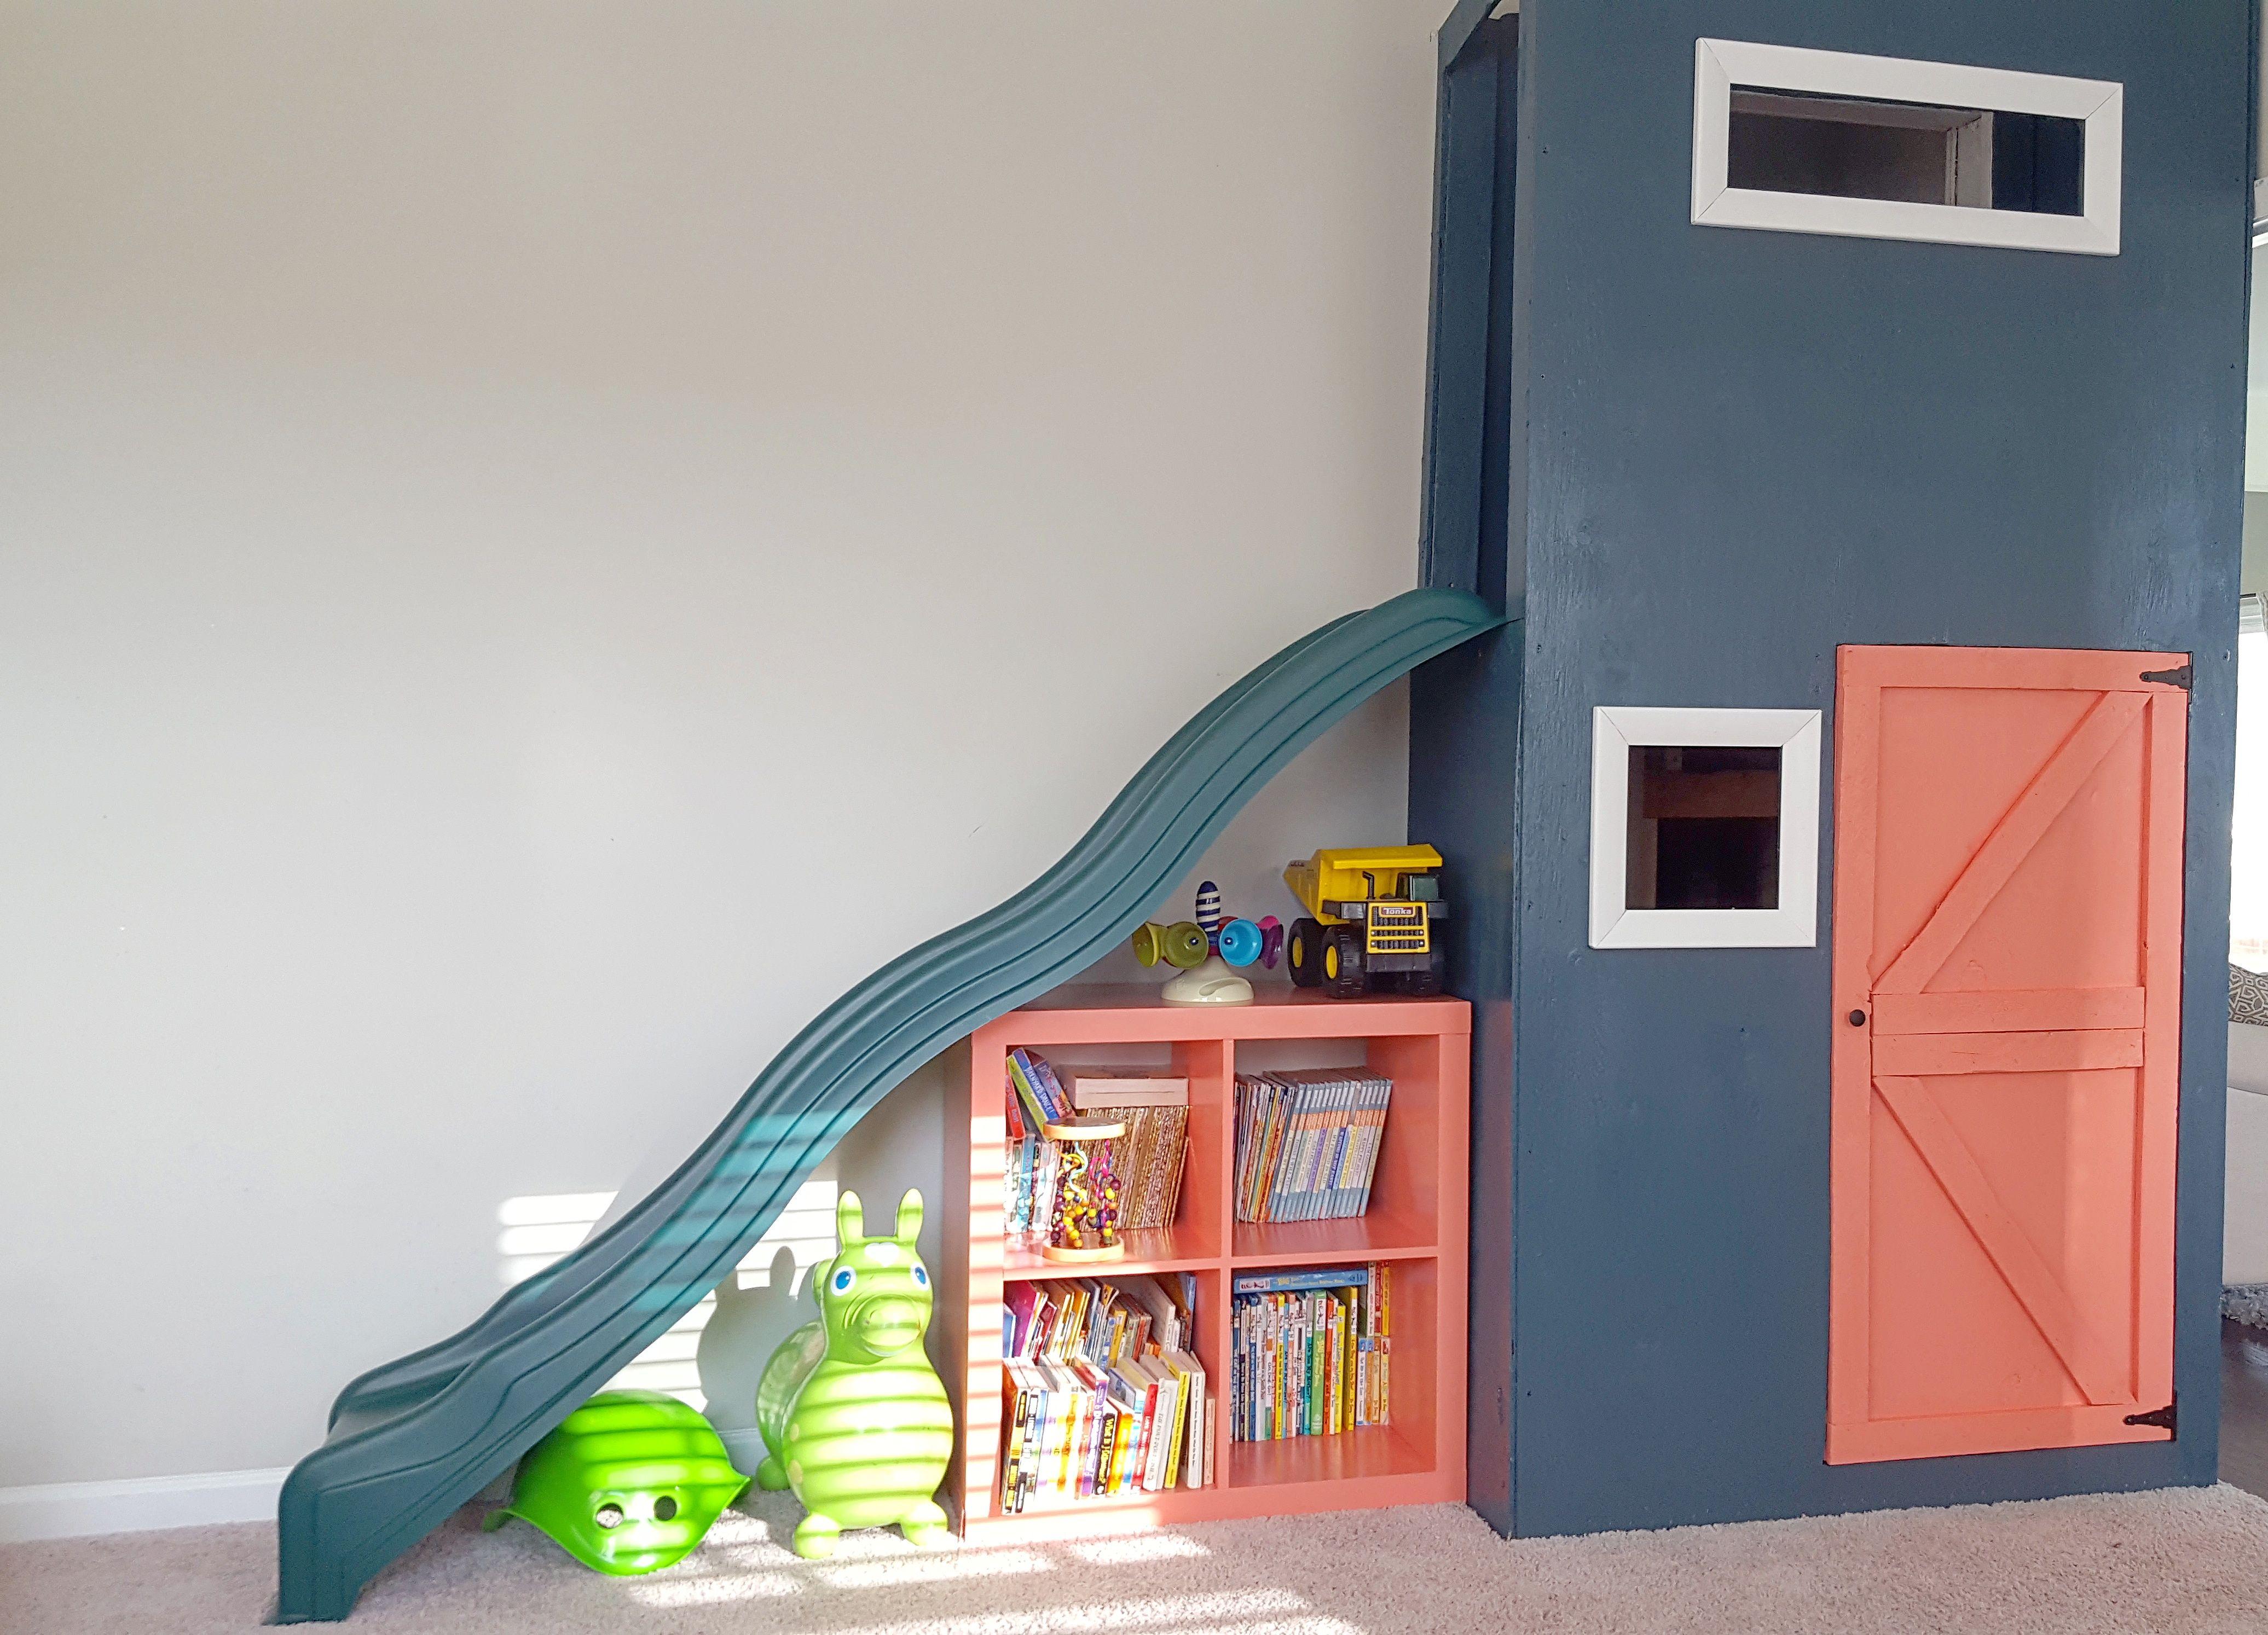 Playroom Slide / Playhouse Indoor Slide, Under Stairs Clubhouse